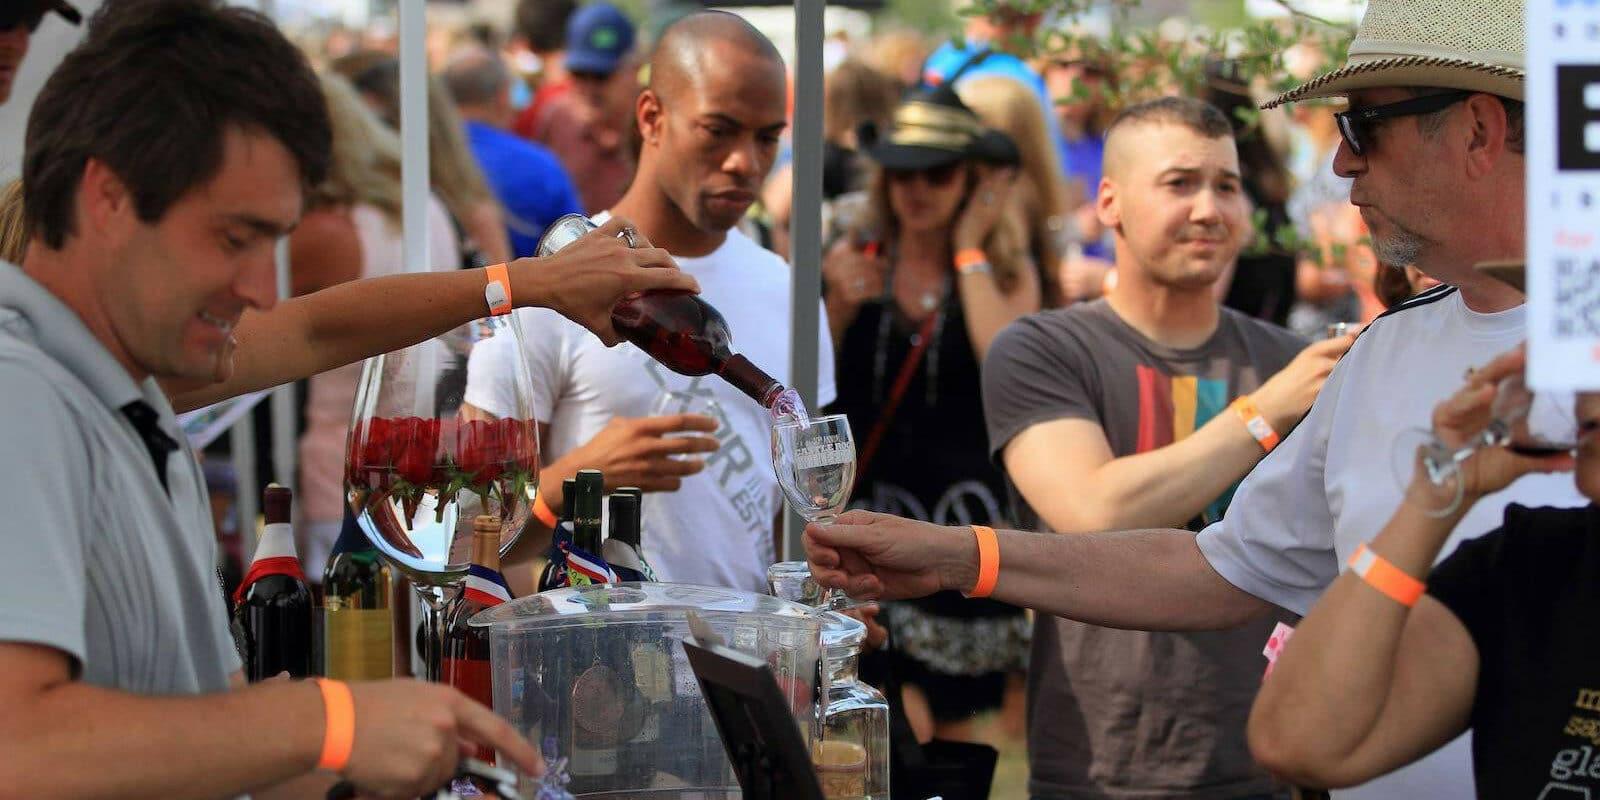 Image of a wine sampling at Castle Rock Winefest in Colorado